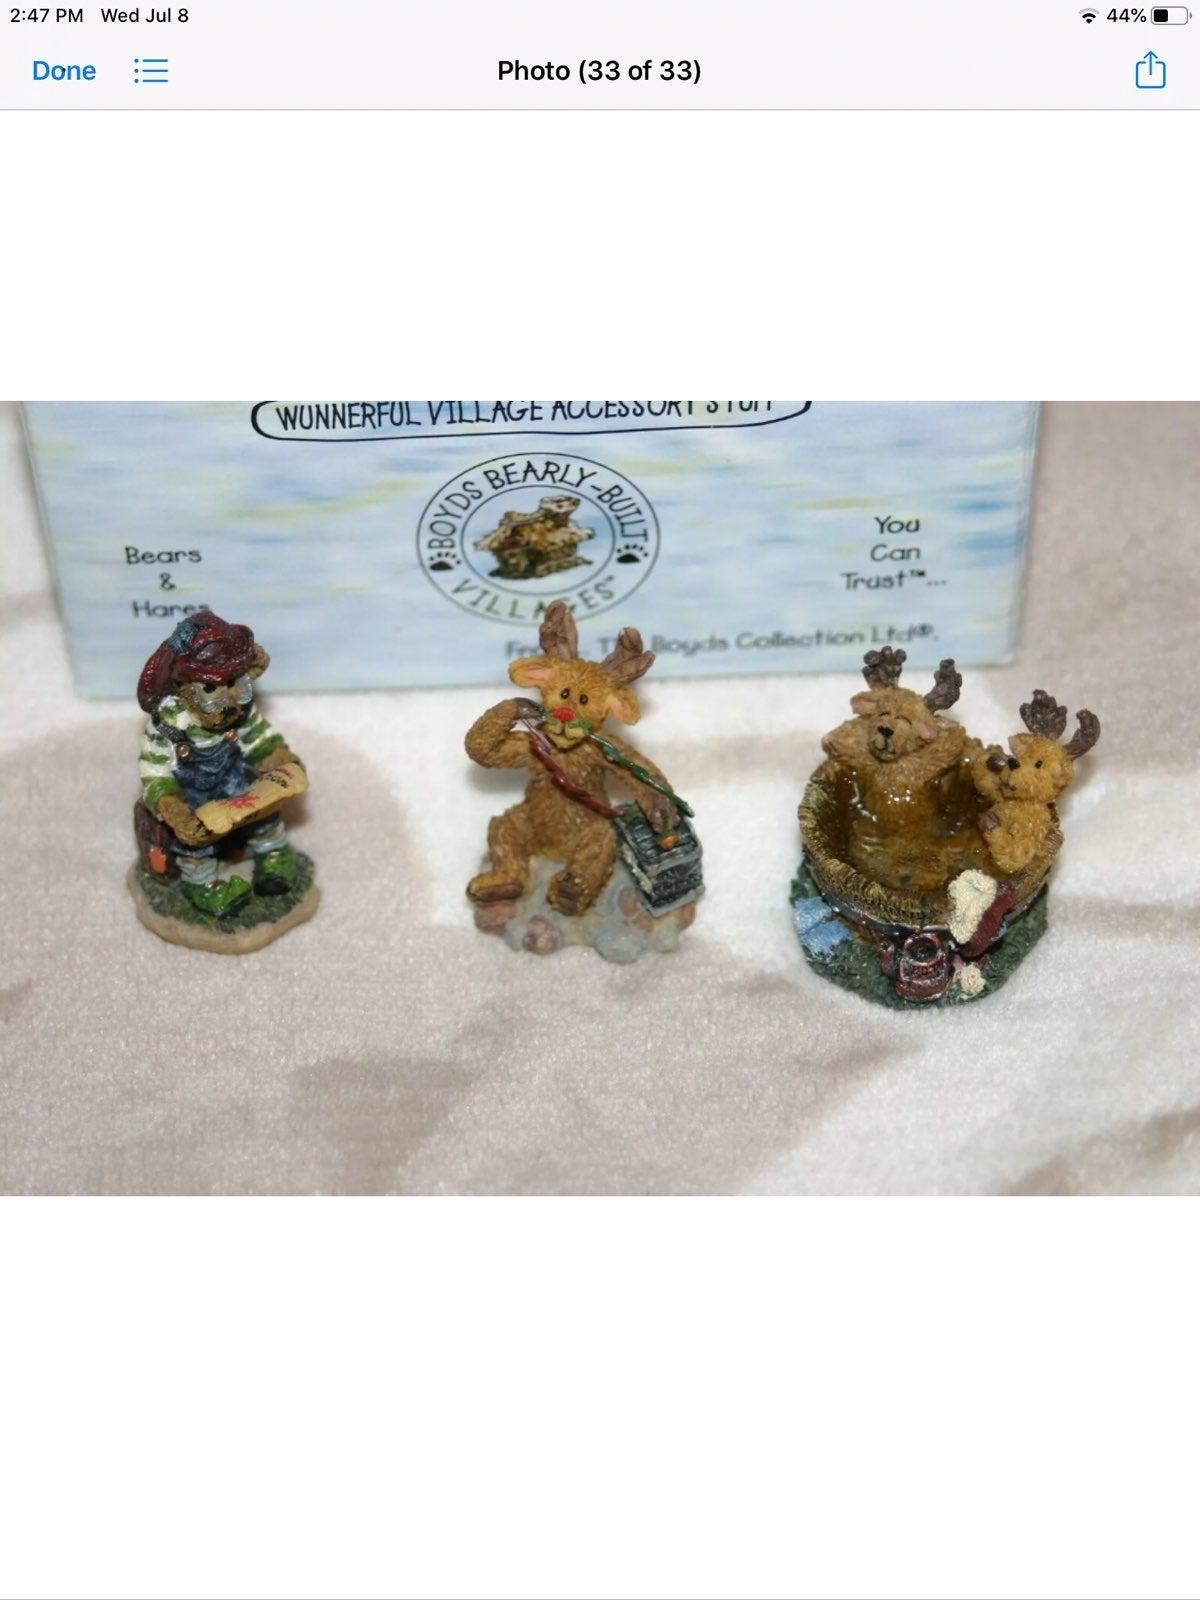 Boyds bear villages accessories